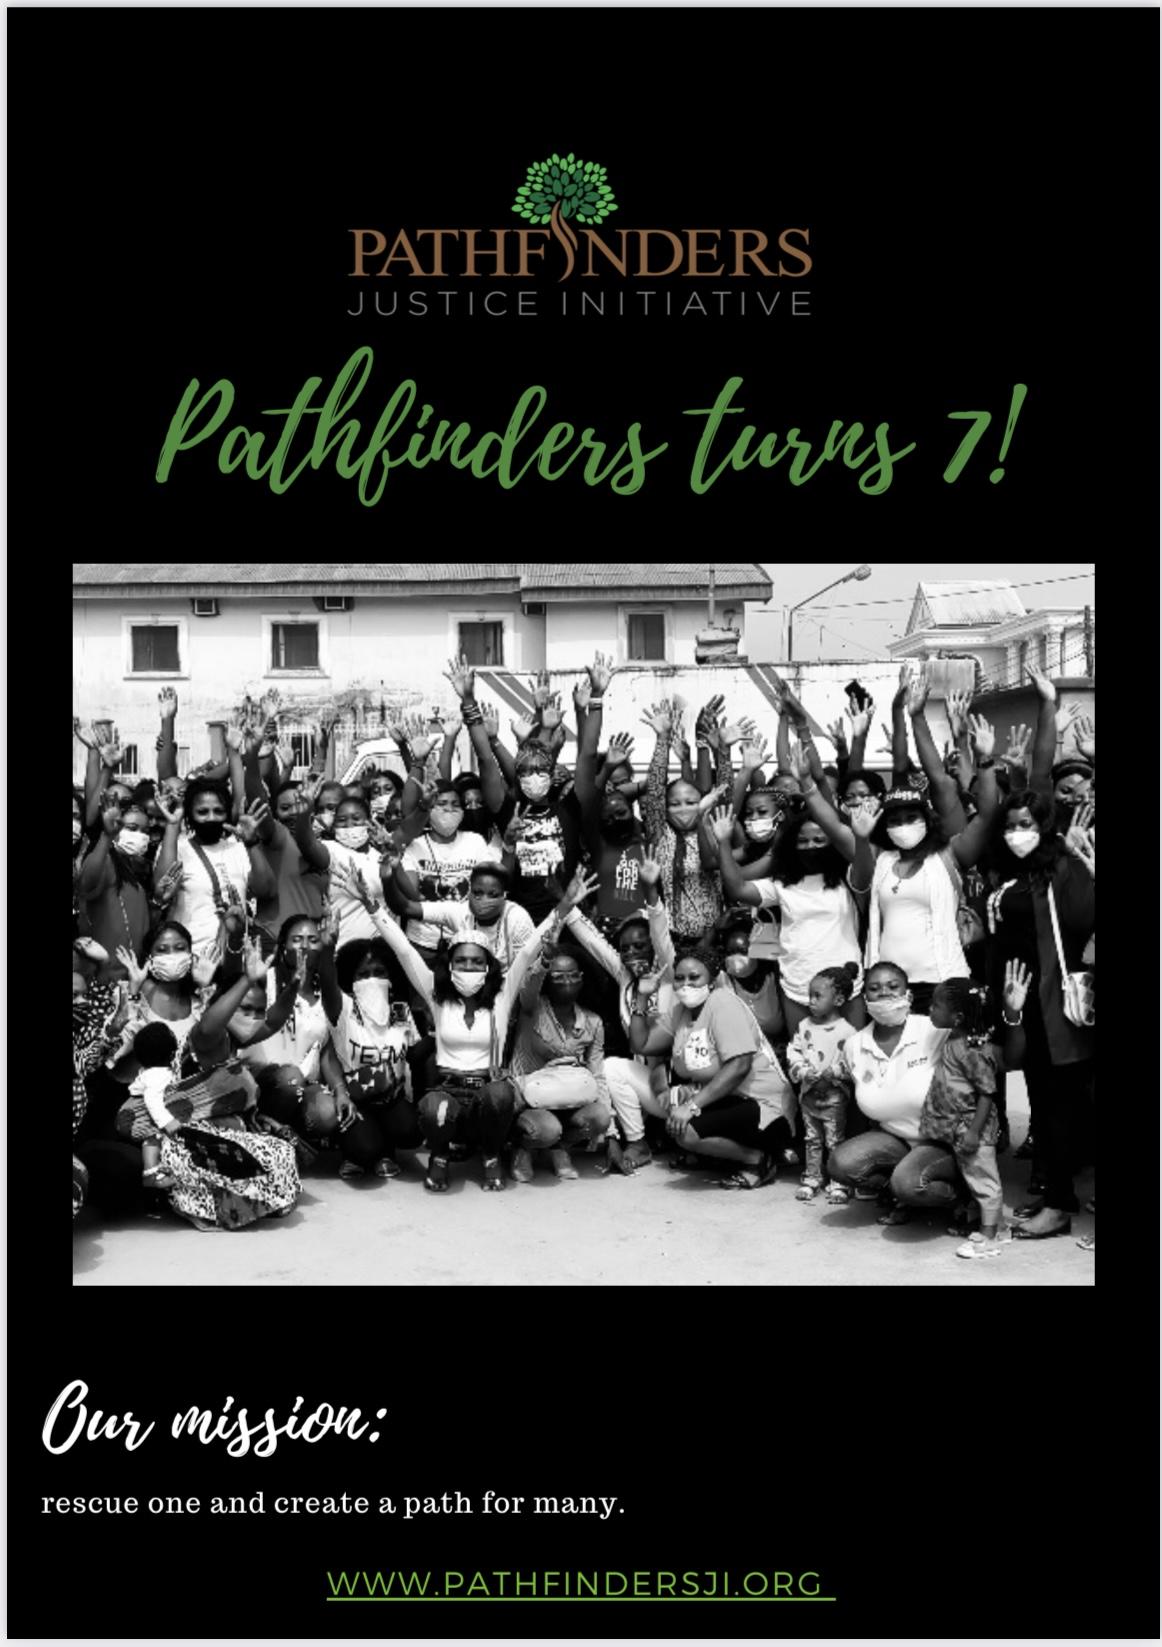 Pathfinders Turns 7!